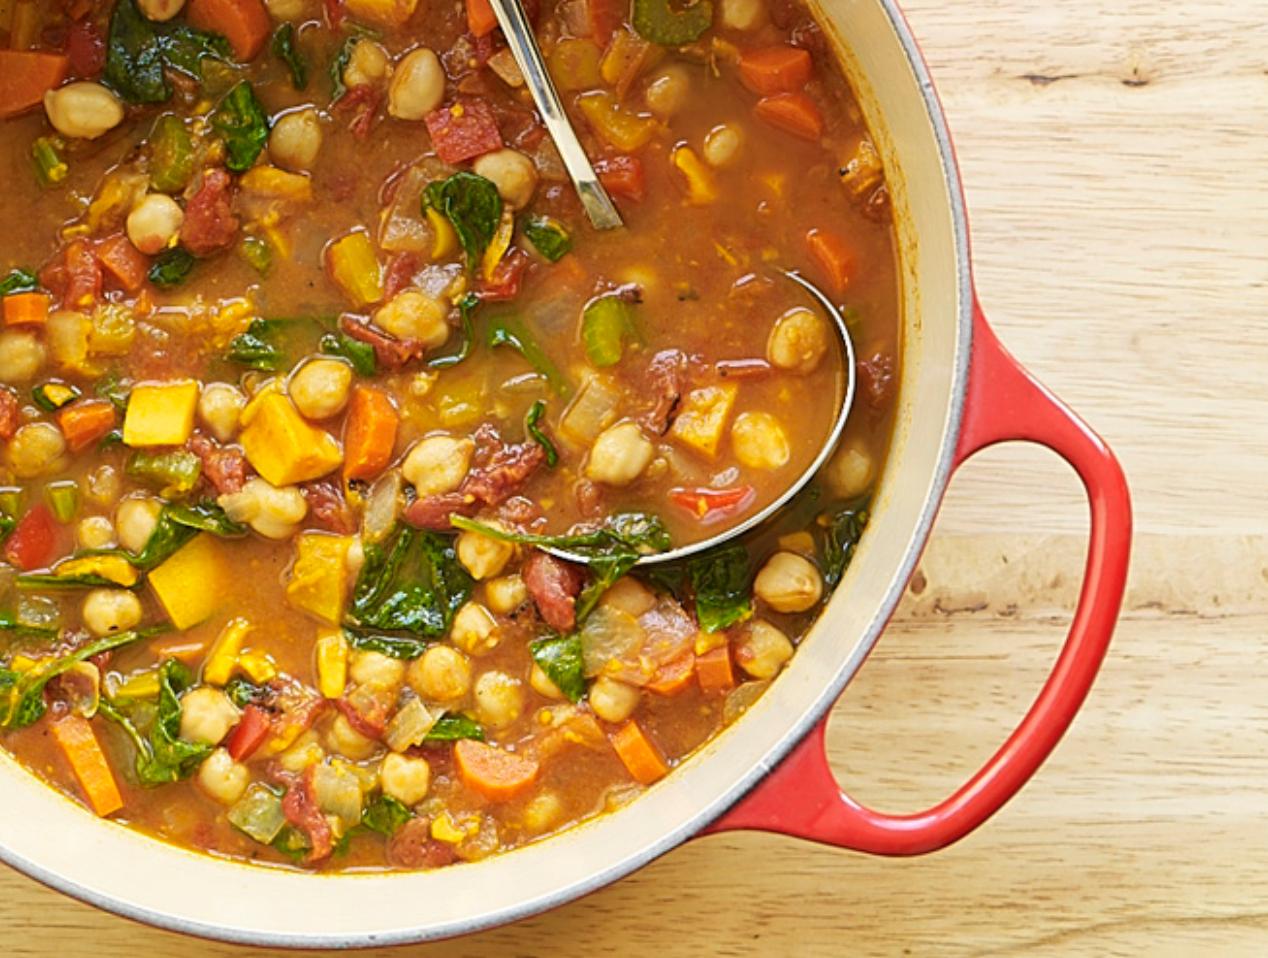 DOLCE DIET LIFESTYLE: 3 Vegan Crockpot Recipes | The Dolce ...